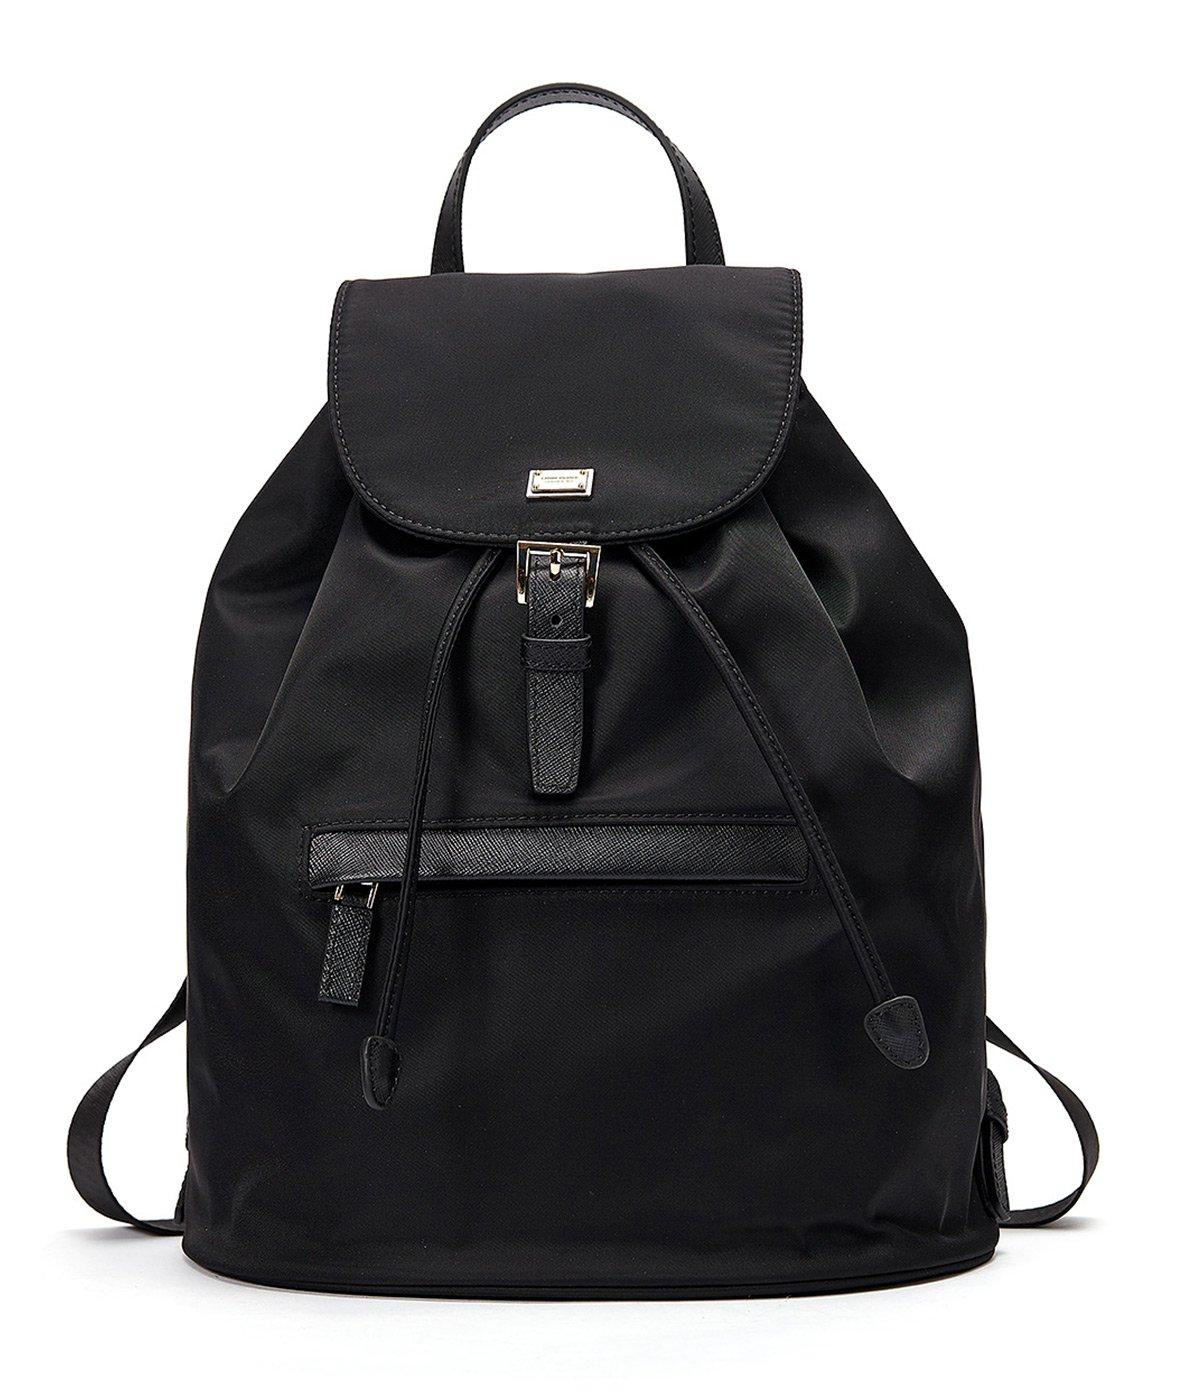 EMINI HOUSE Women's Nylon Backpack Drwastring school Multifunction Backpack-Black